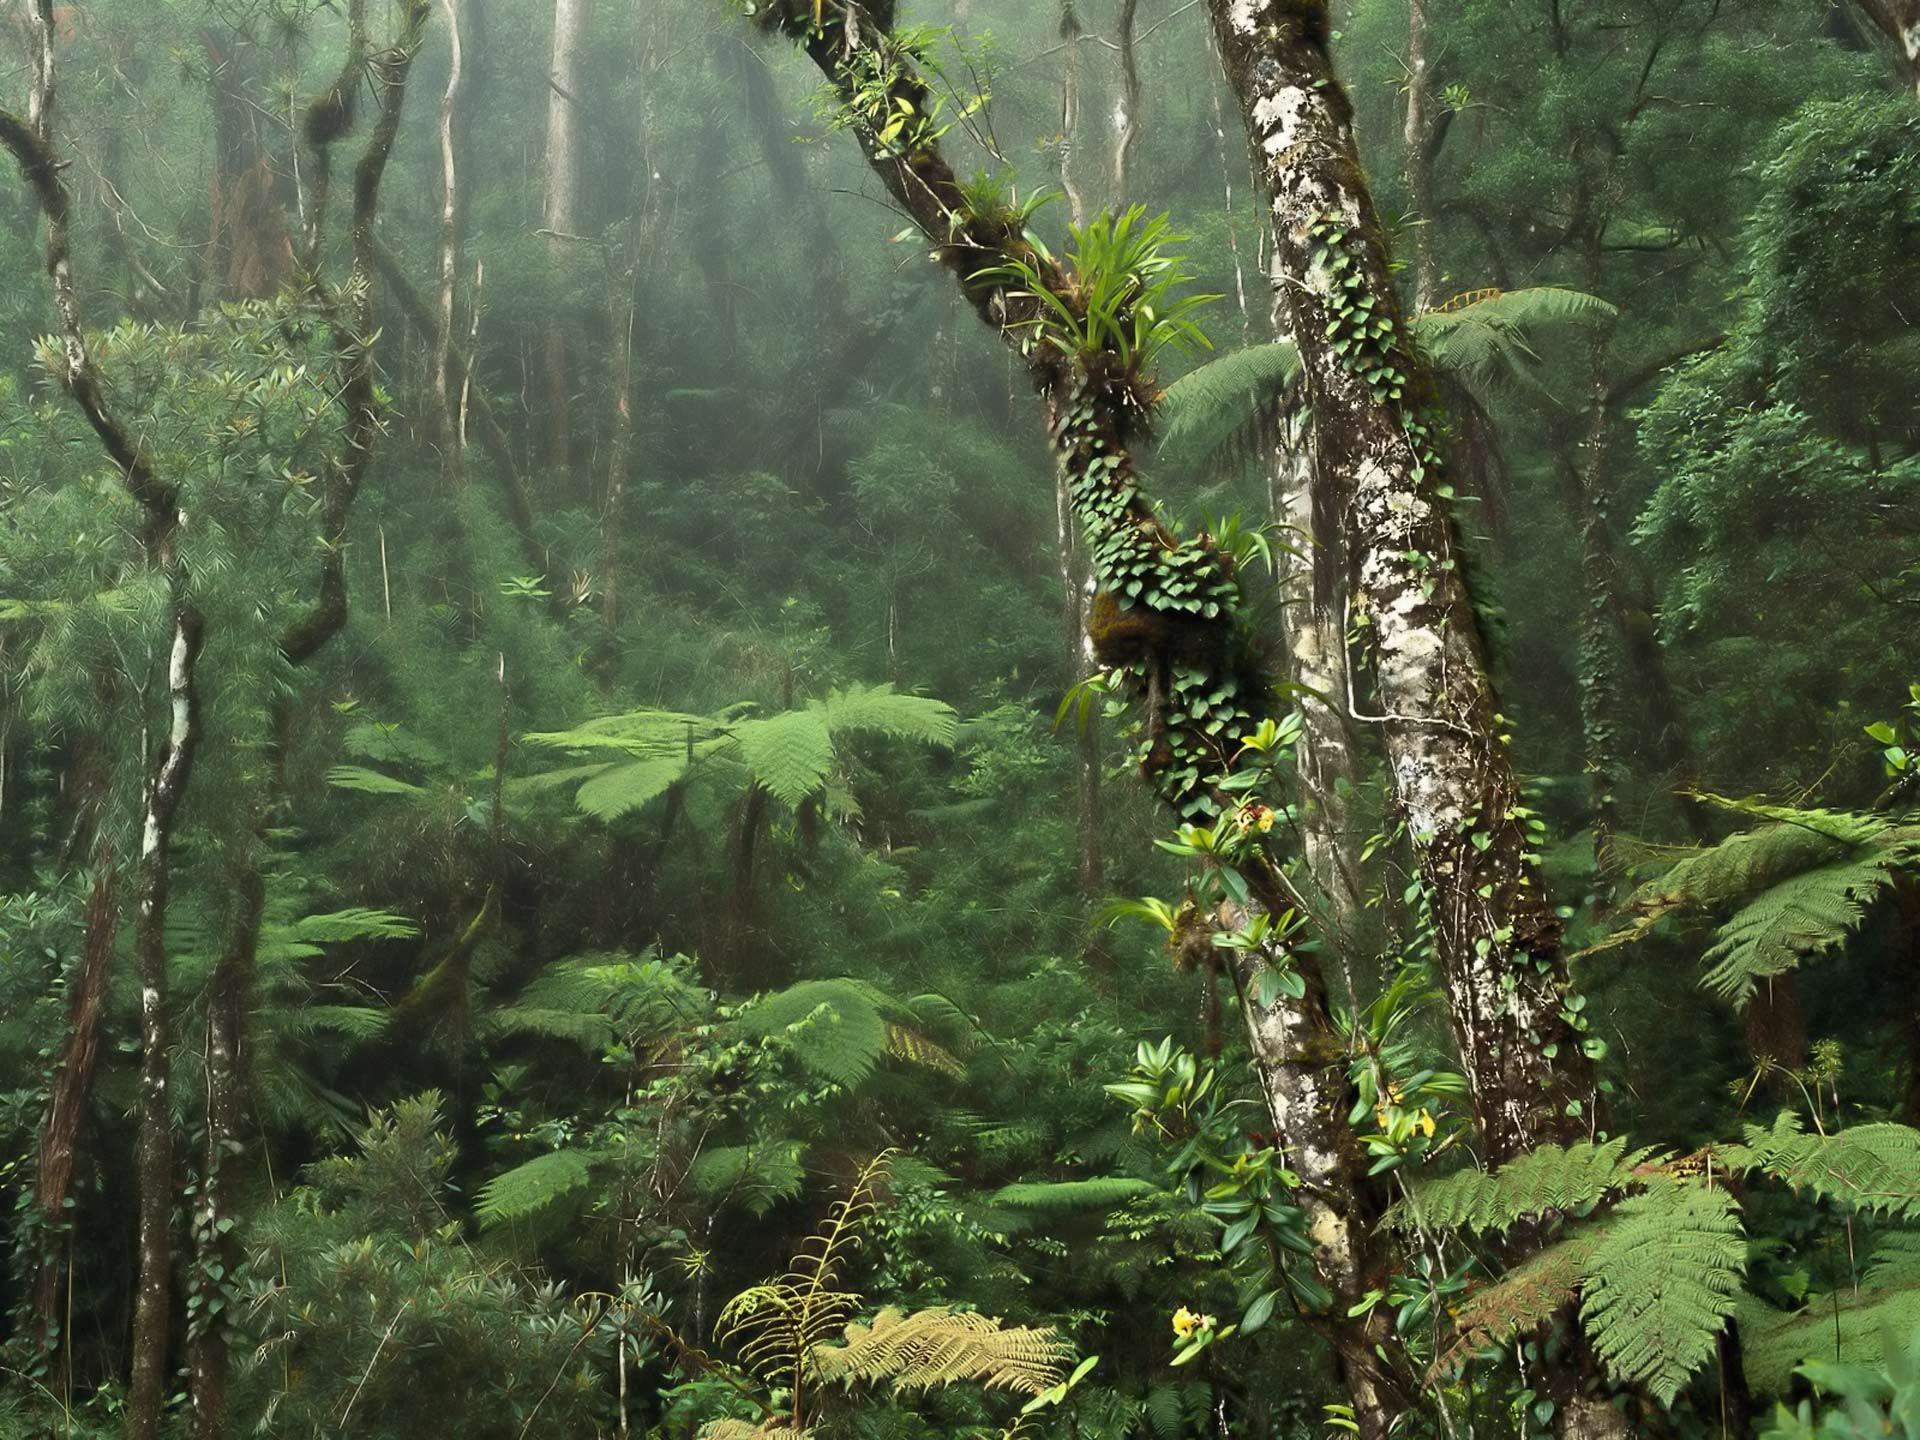 Res: 1920x1440, Damp misty rainforest wallpaper